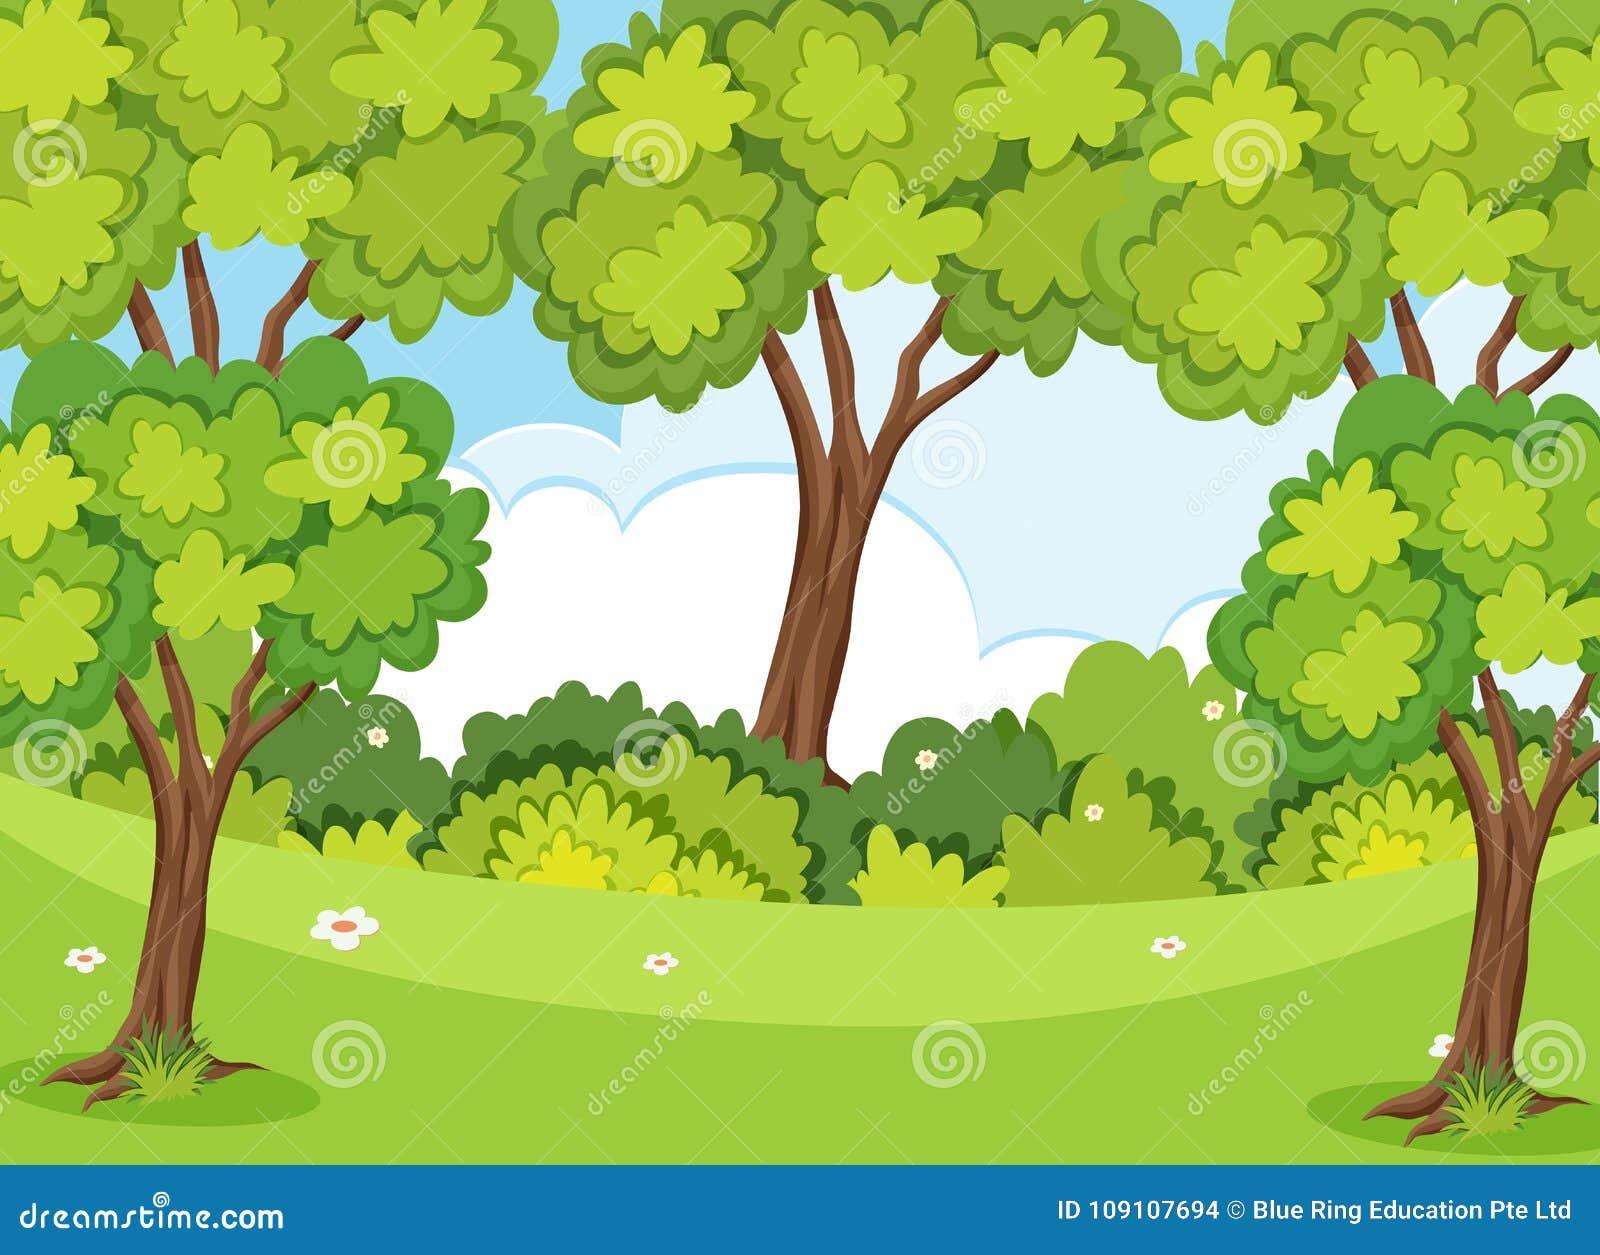 Natury scena z drzewami i gazonem